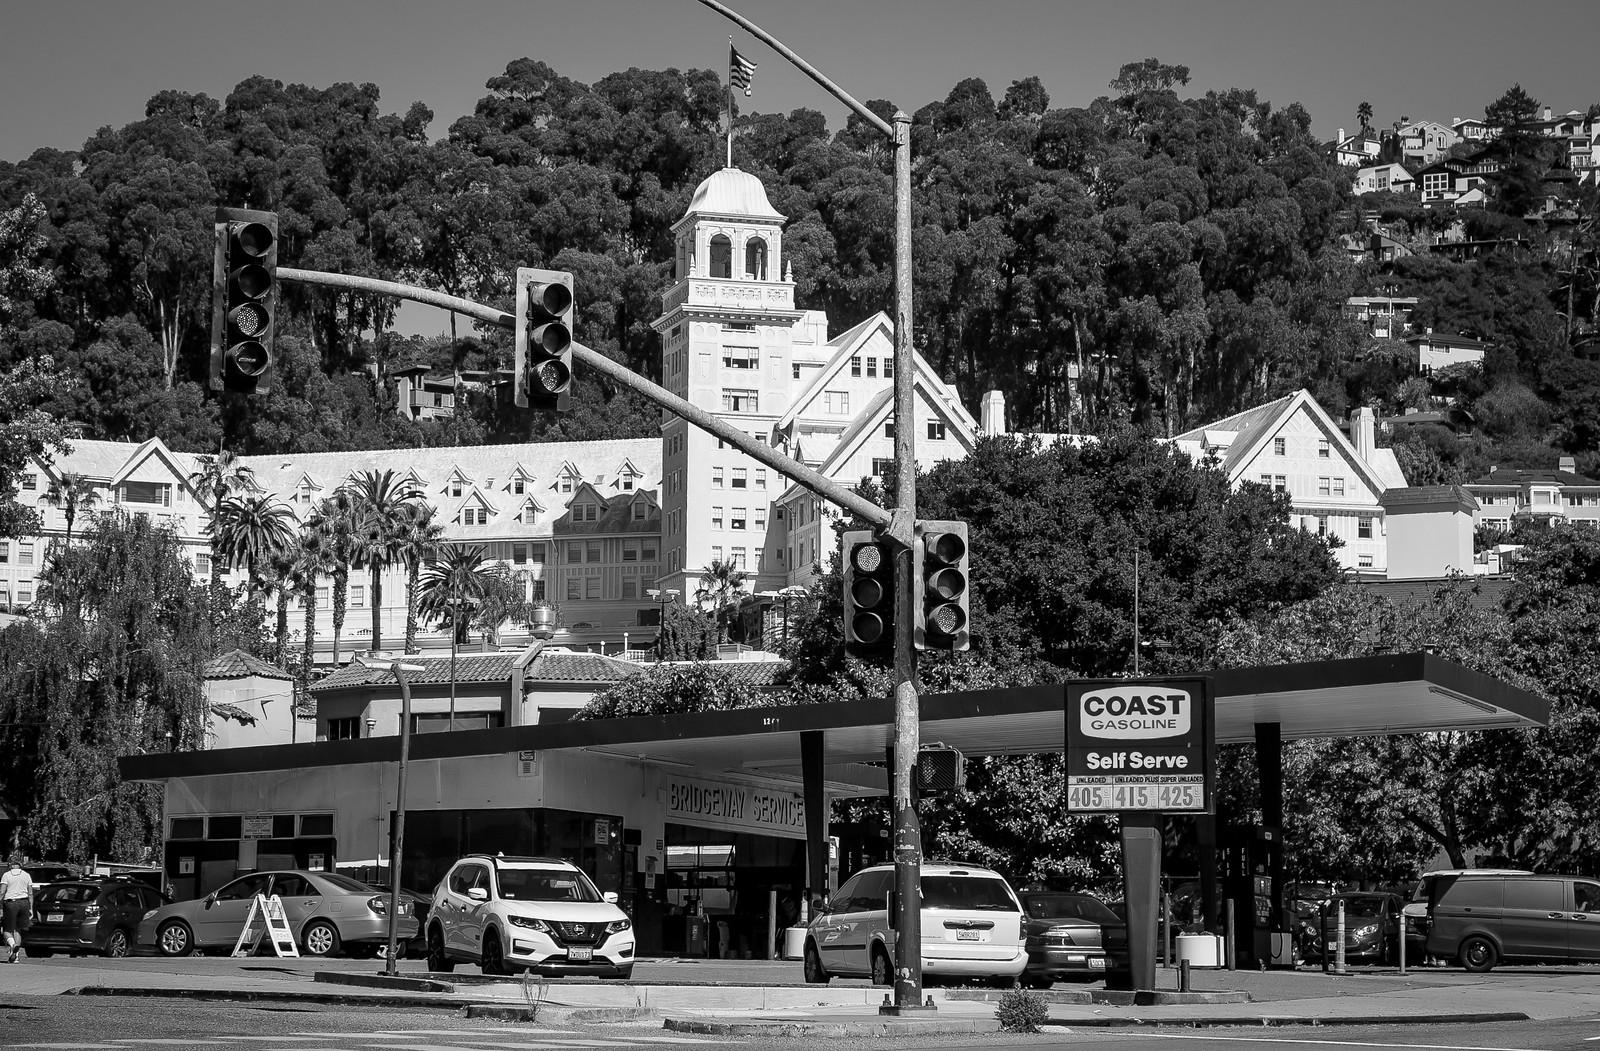 Quirky Berkeley in Berkeley, Calif. on September 25th, 2019.